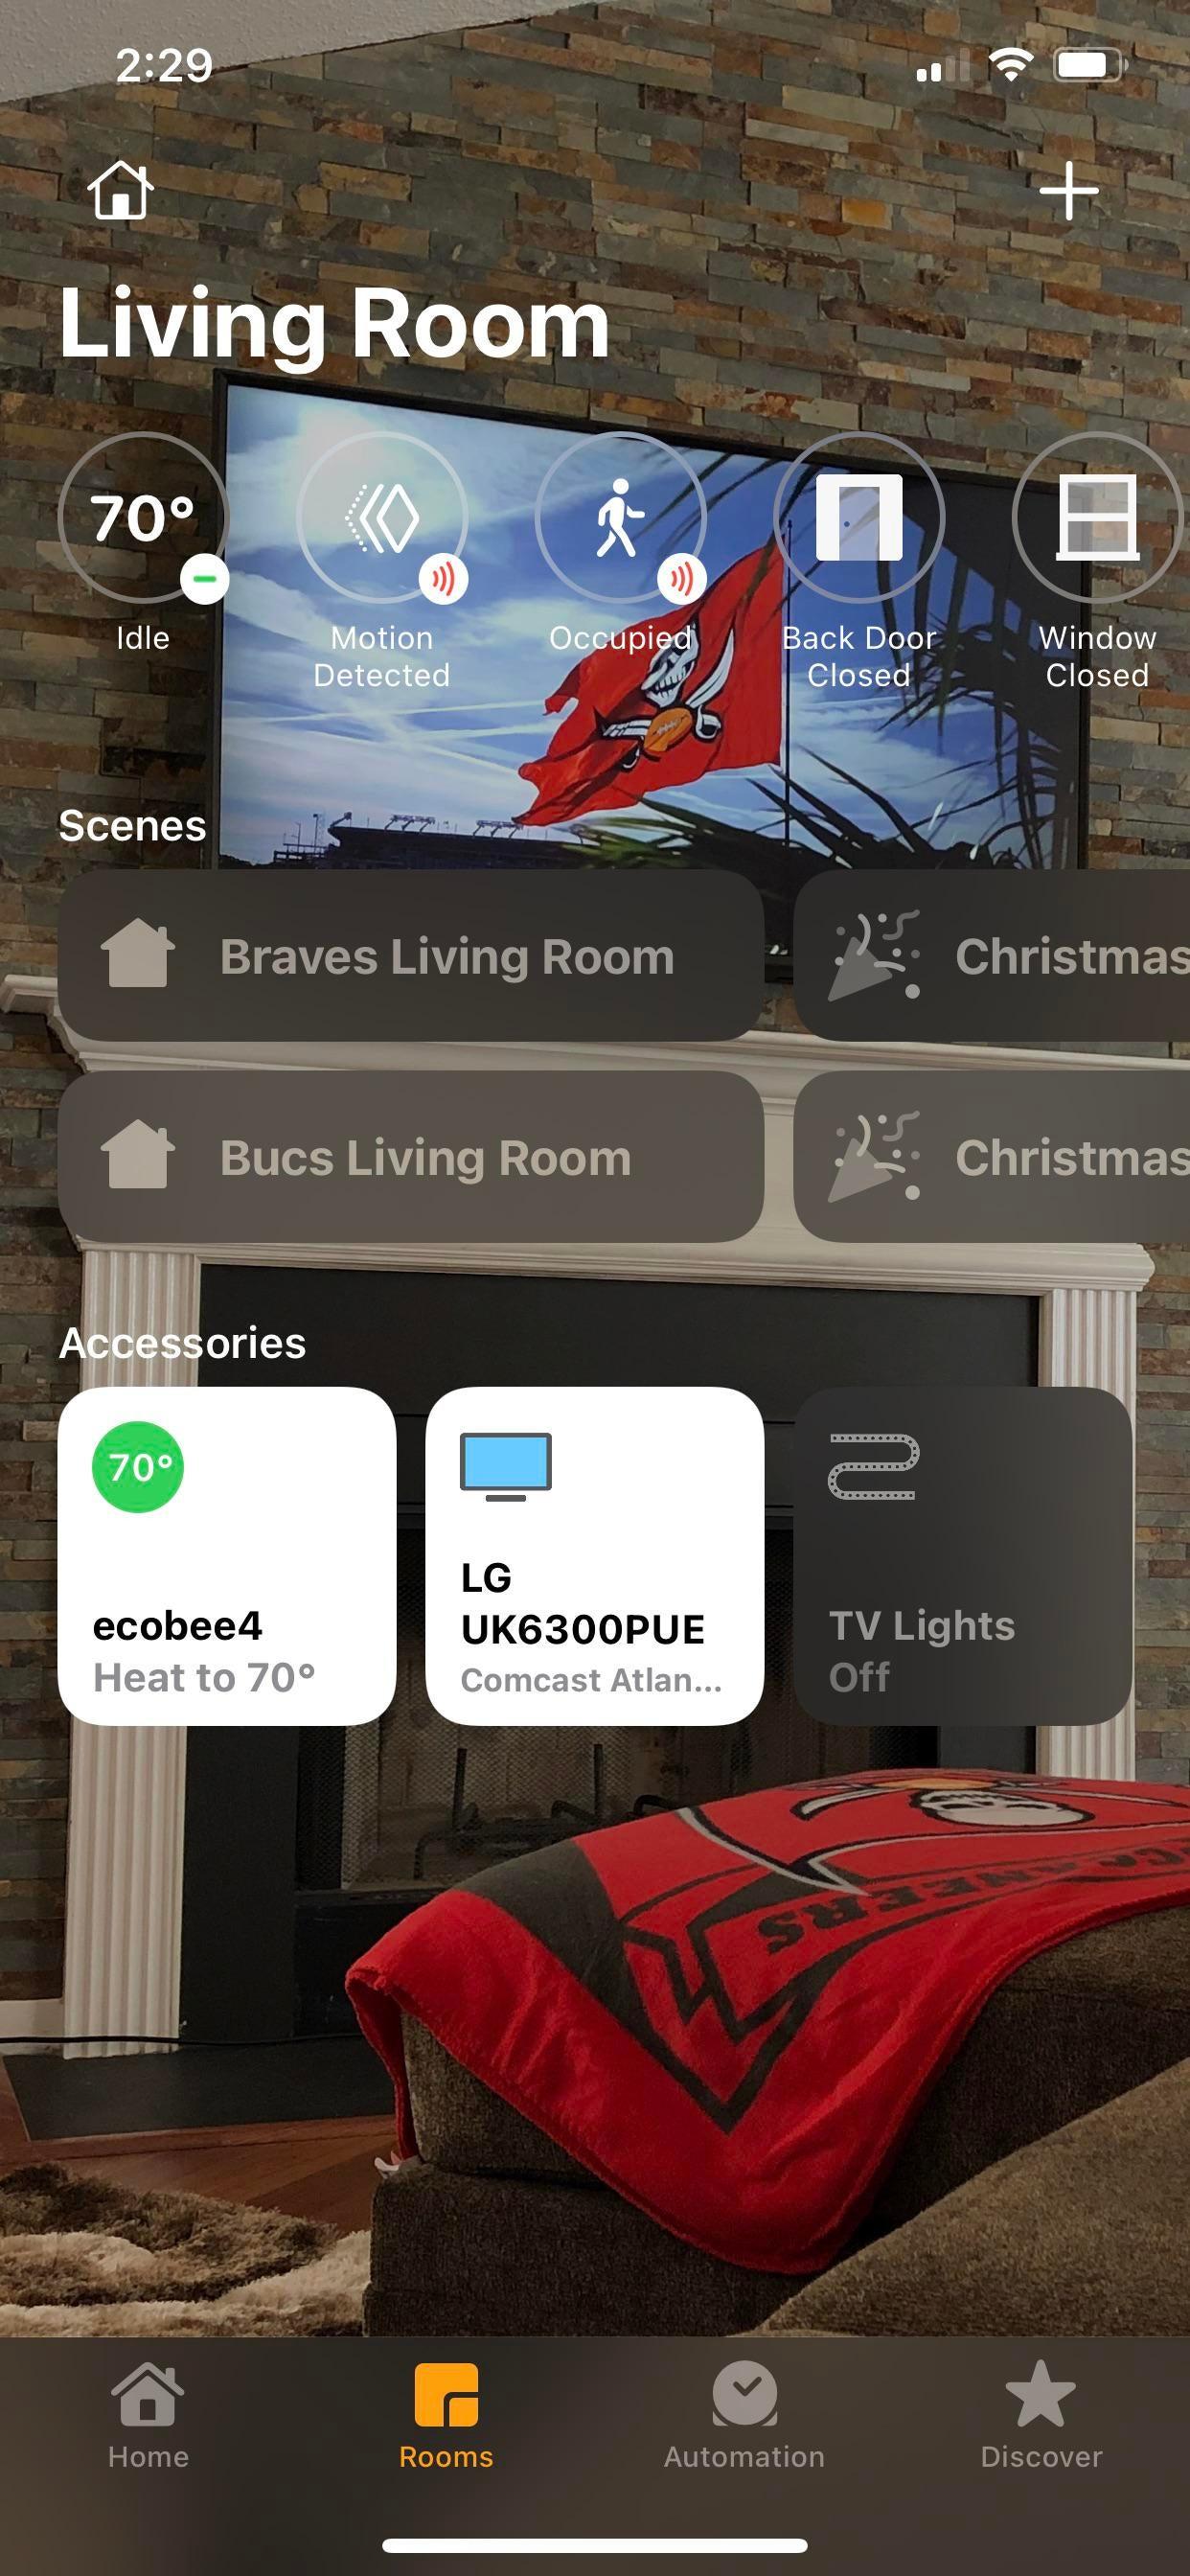 HomeKit Finally added to LG TV